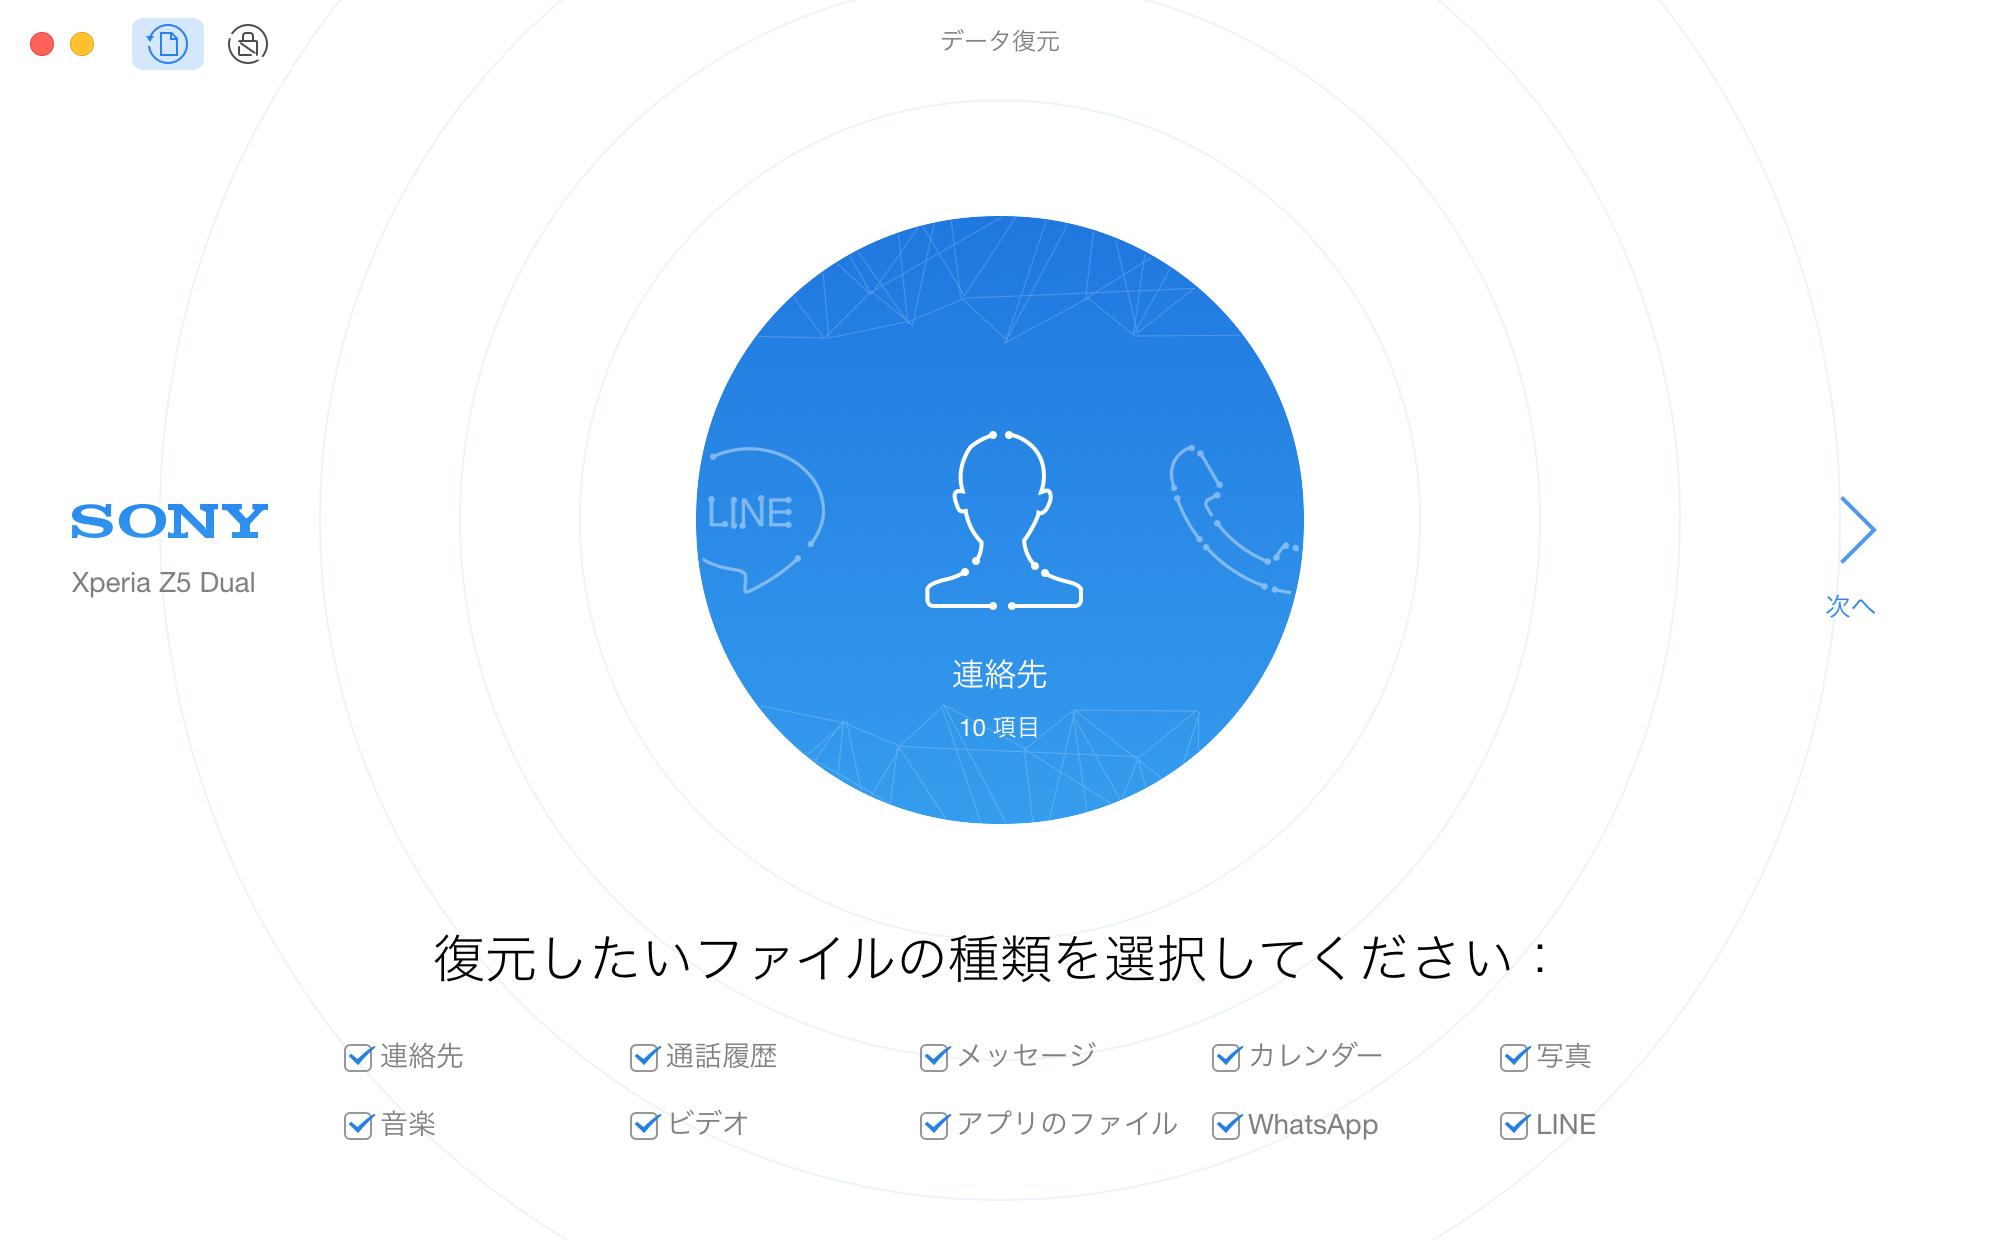 PhoneRescue - SONYデータ復元のメインインターフェース